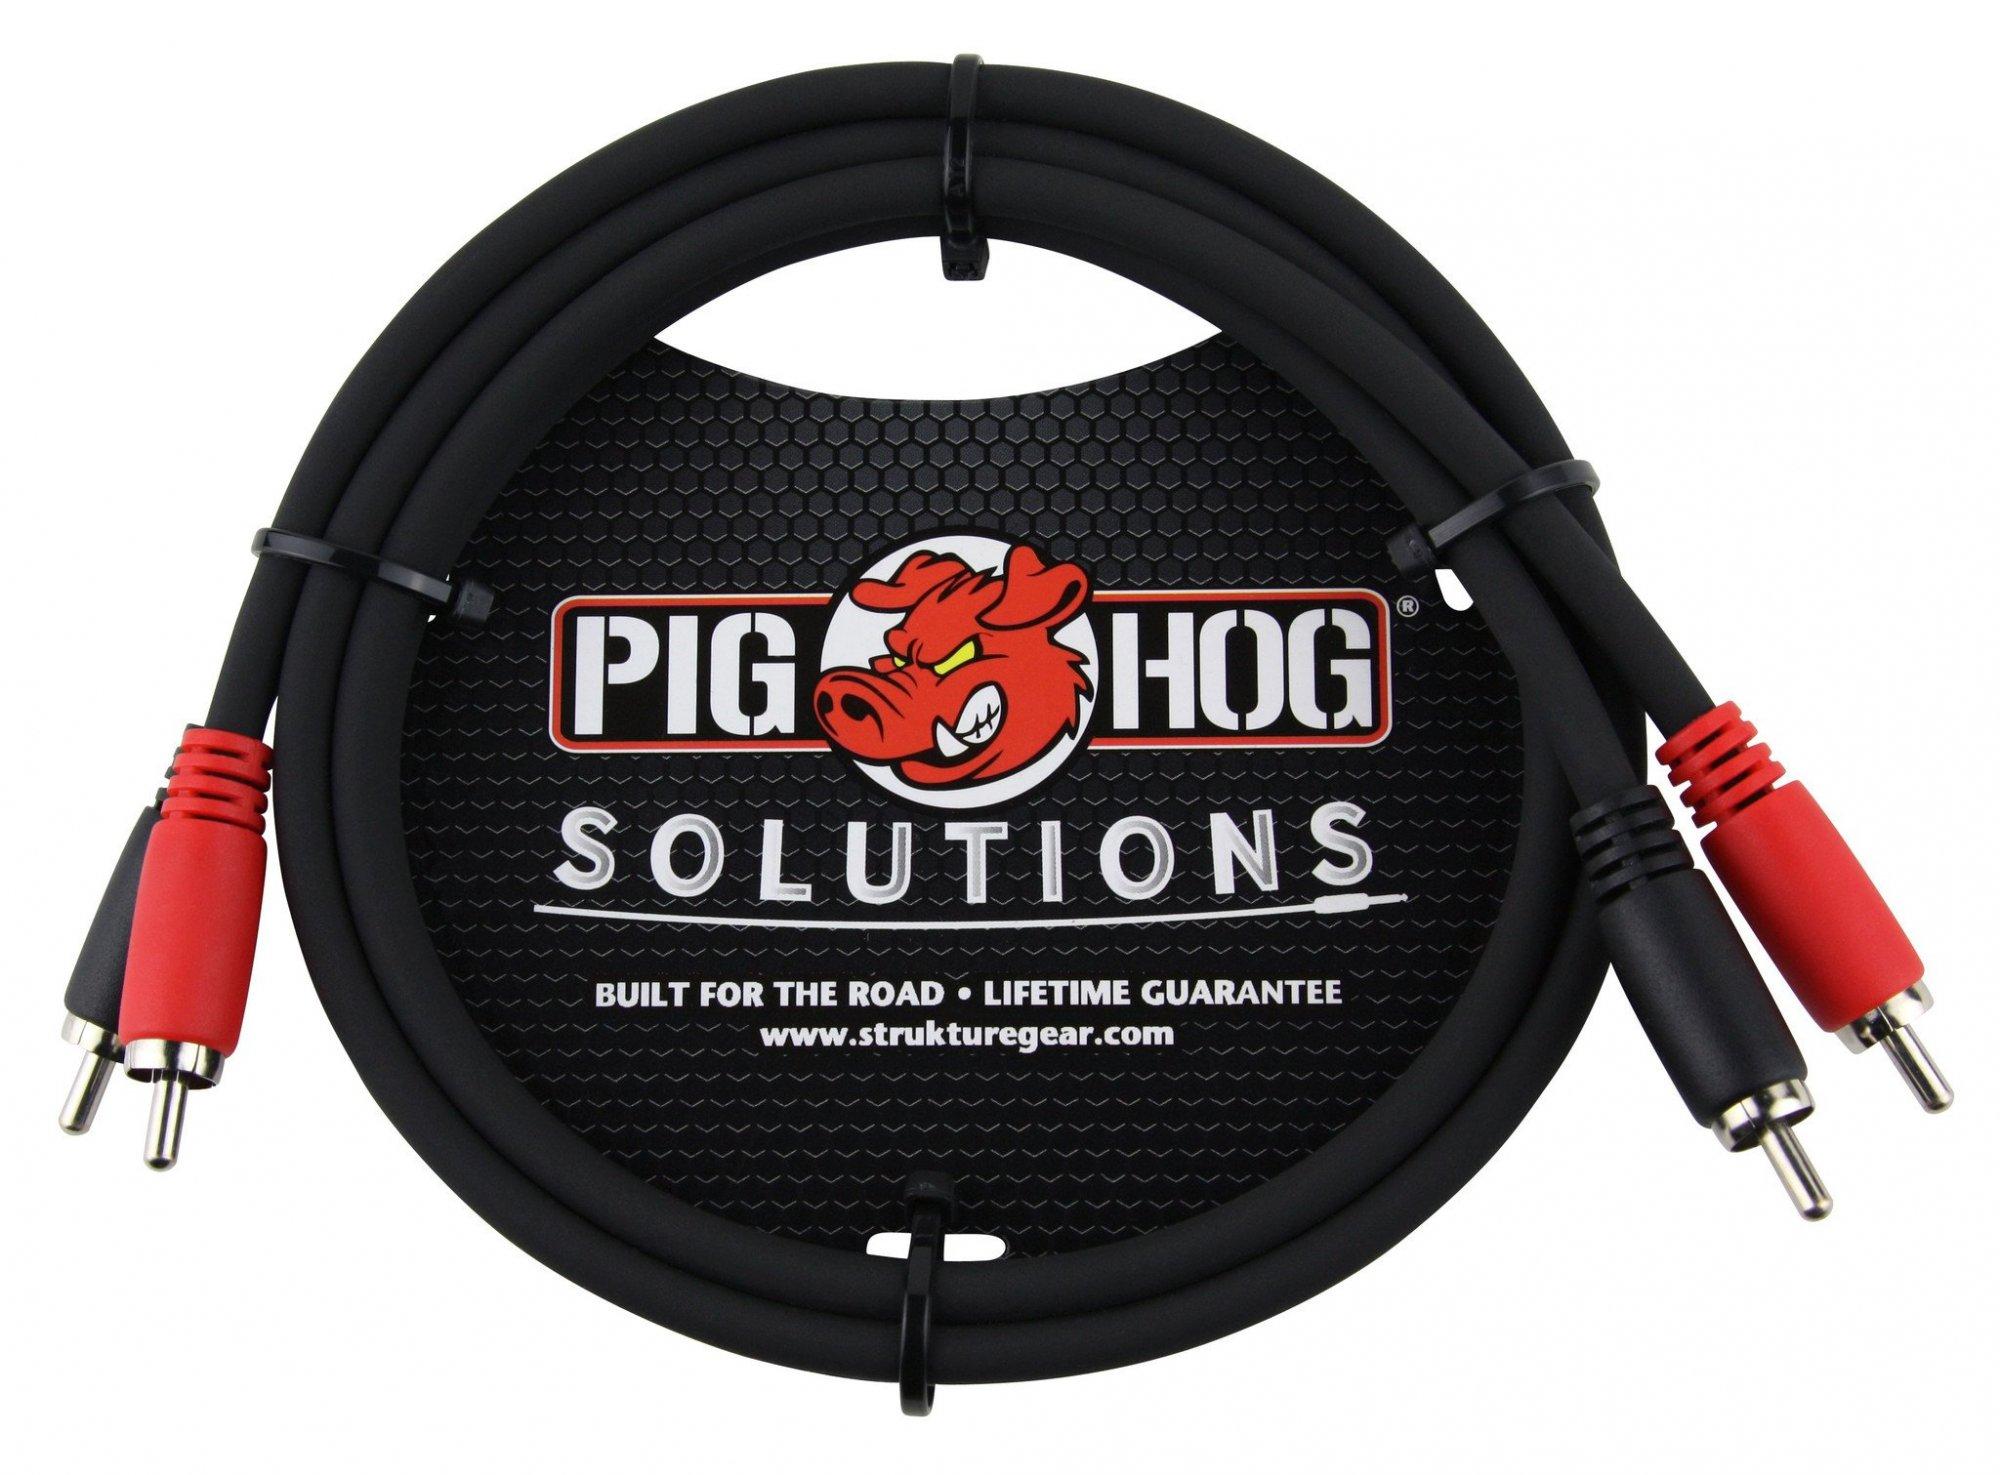 Pig Hog RCA Cables